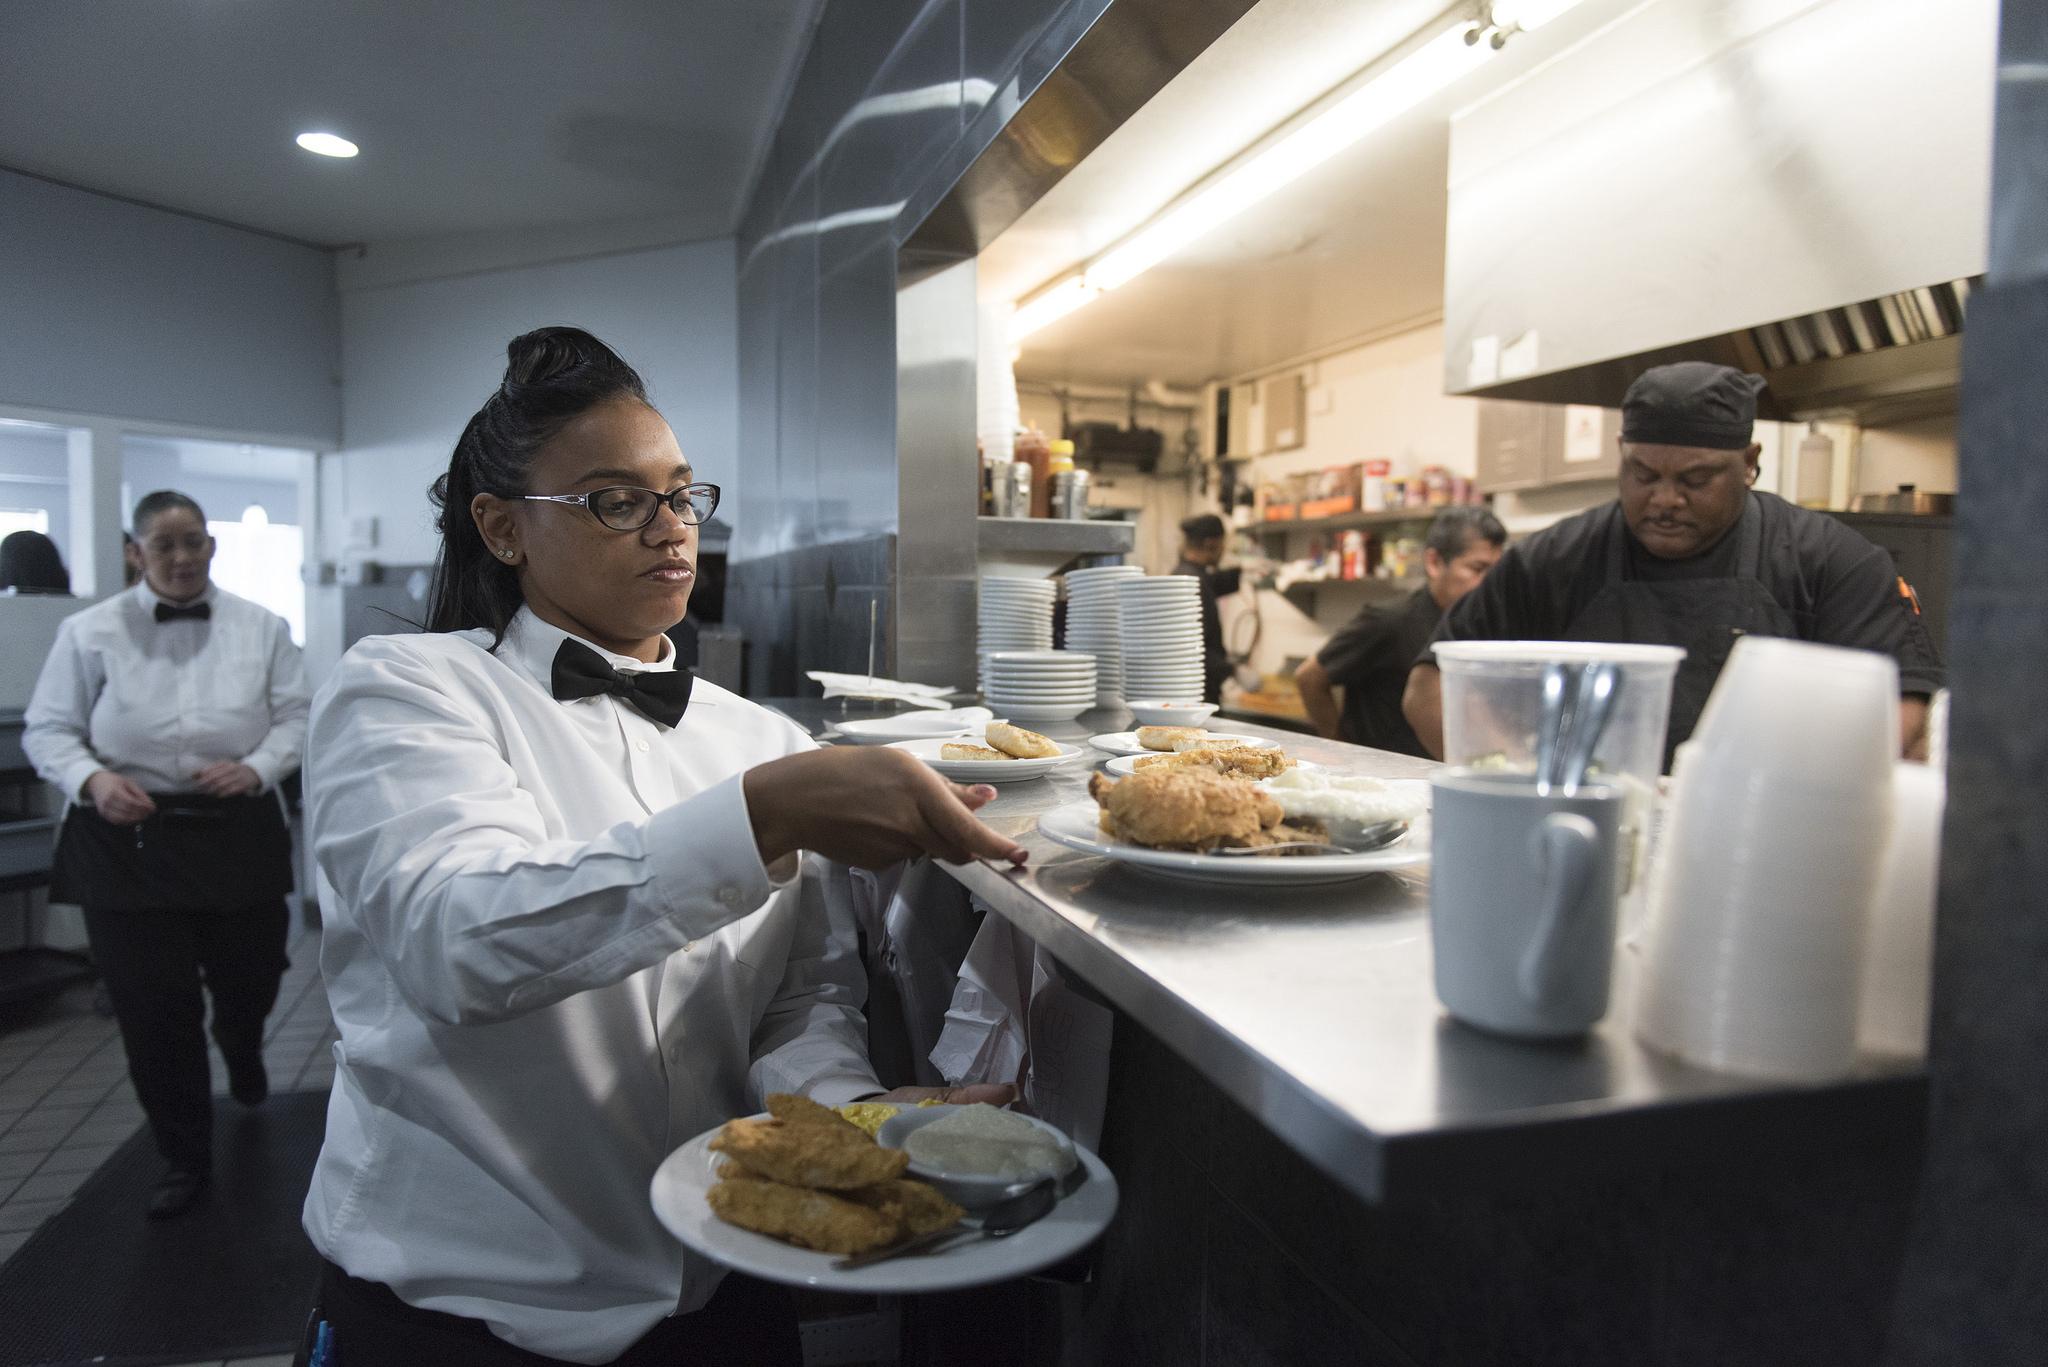 Waitress TaShara McCray, left, prepares to take food to customers at M&M Soul Food Cafe at 2211 S. Las Vegas Blvd. in Las Vegas Saturday, Jan. 2, 2016. Jason Ogulnik/Las Vegas Review-Journal